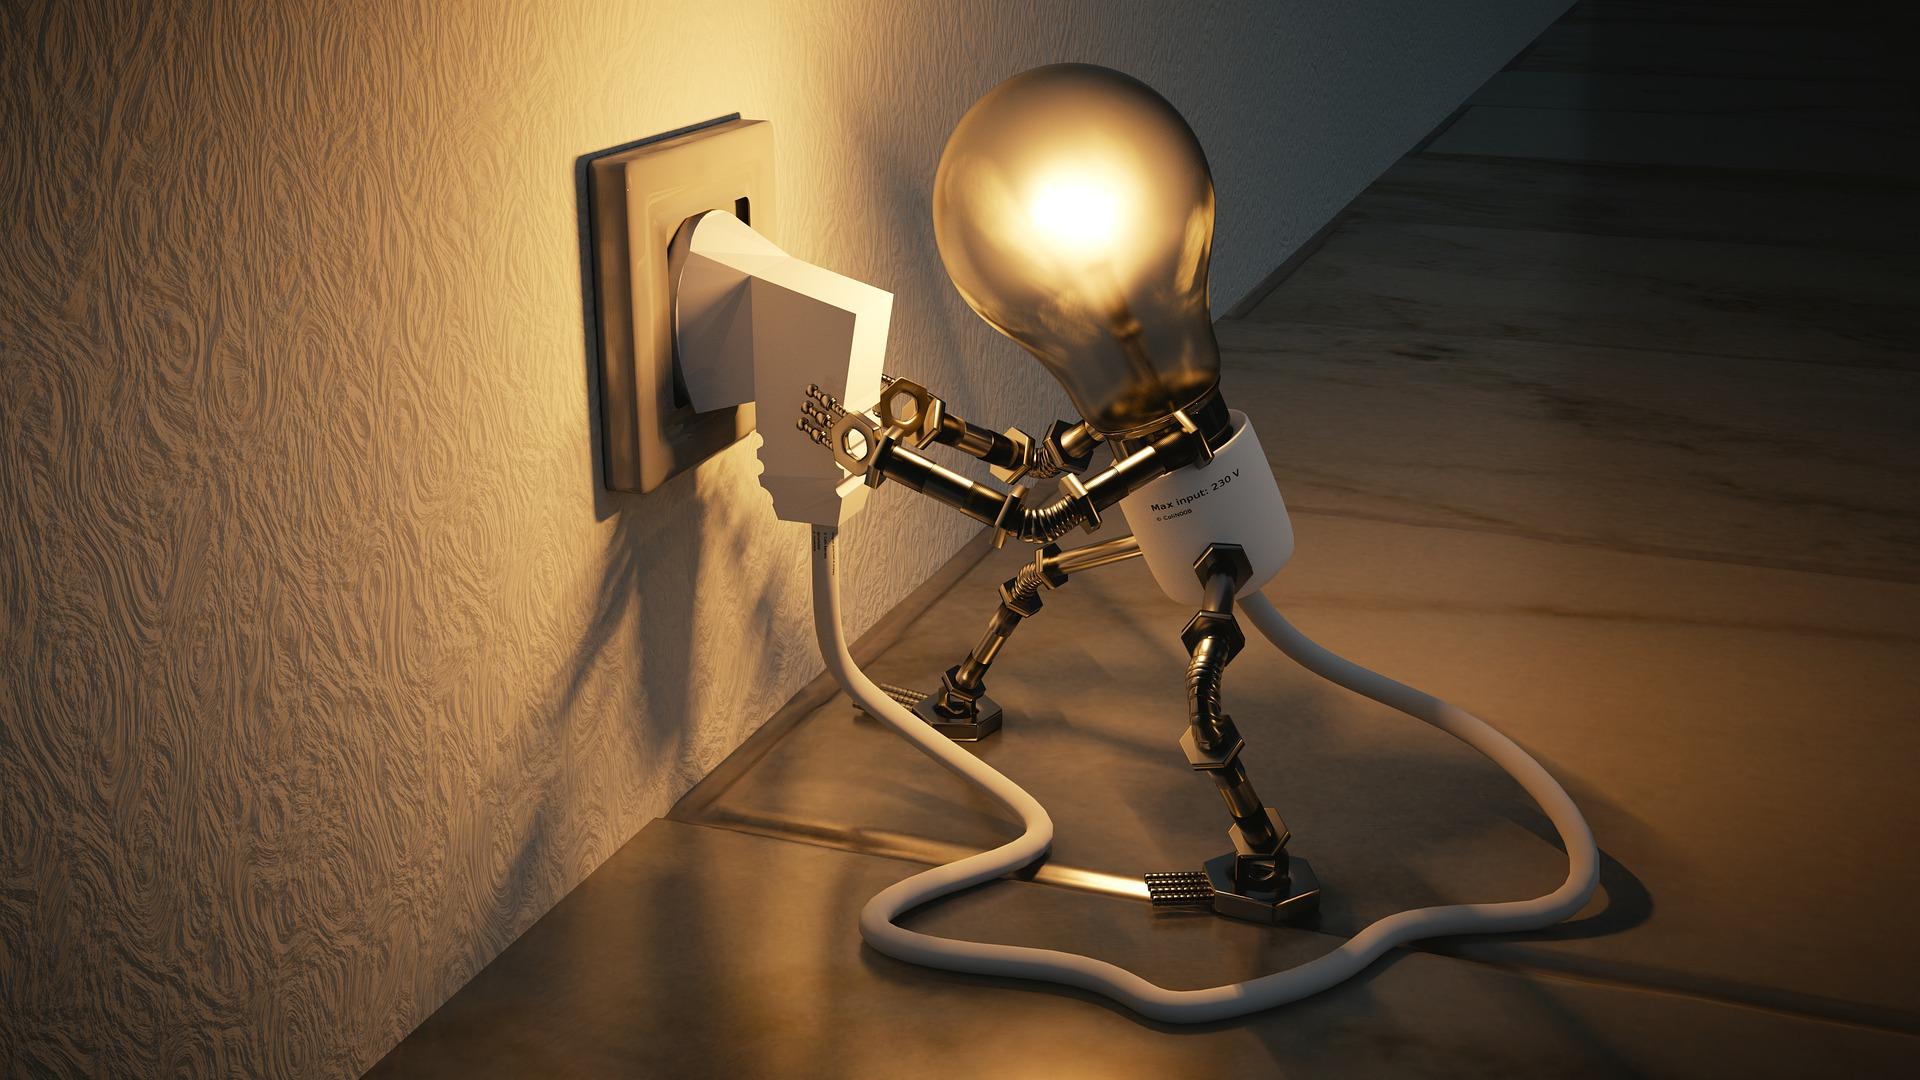 Light bulb representing the business idea